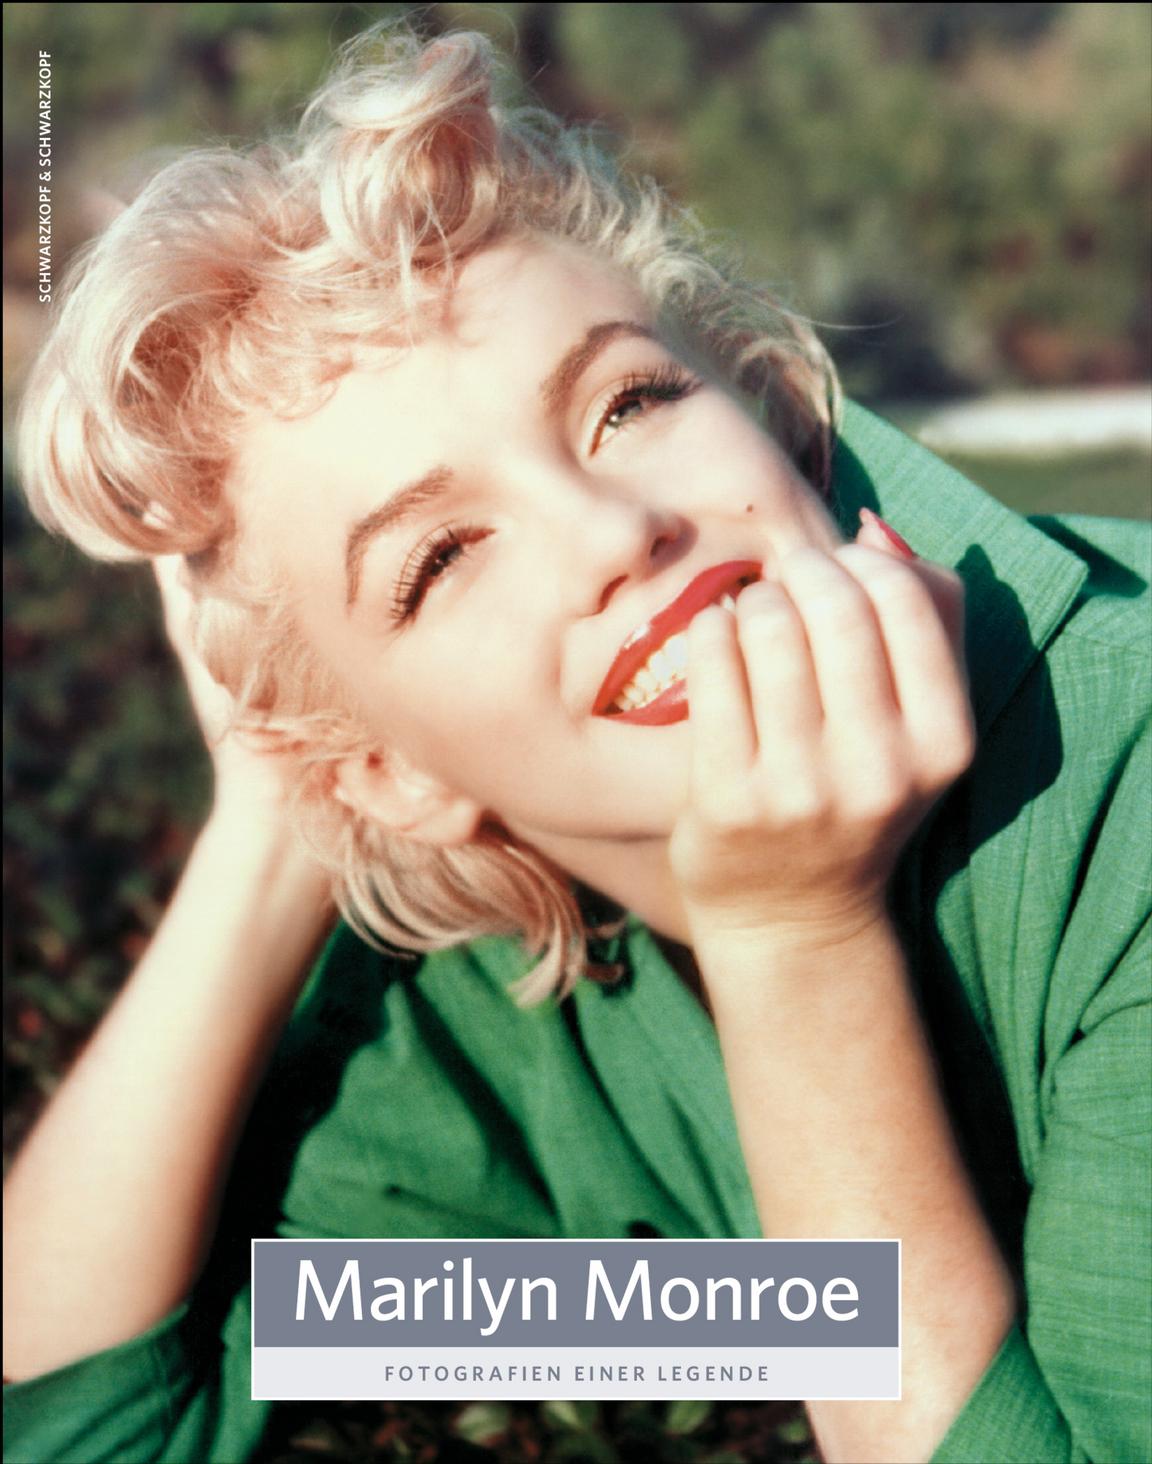 Marilyn Monroe: Fotografien einer Legende - Nic...